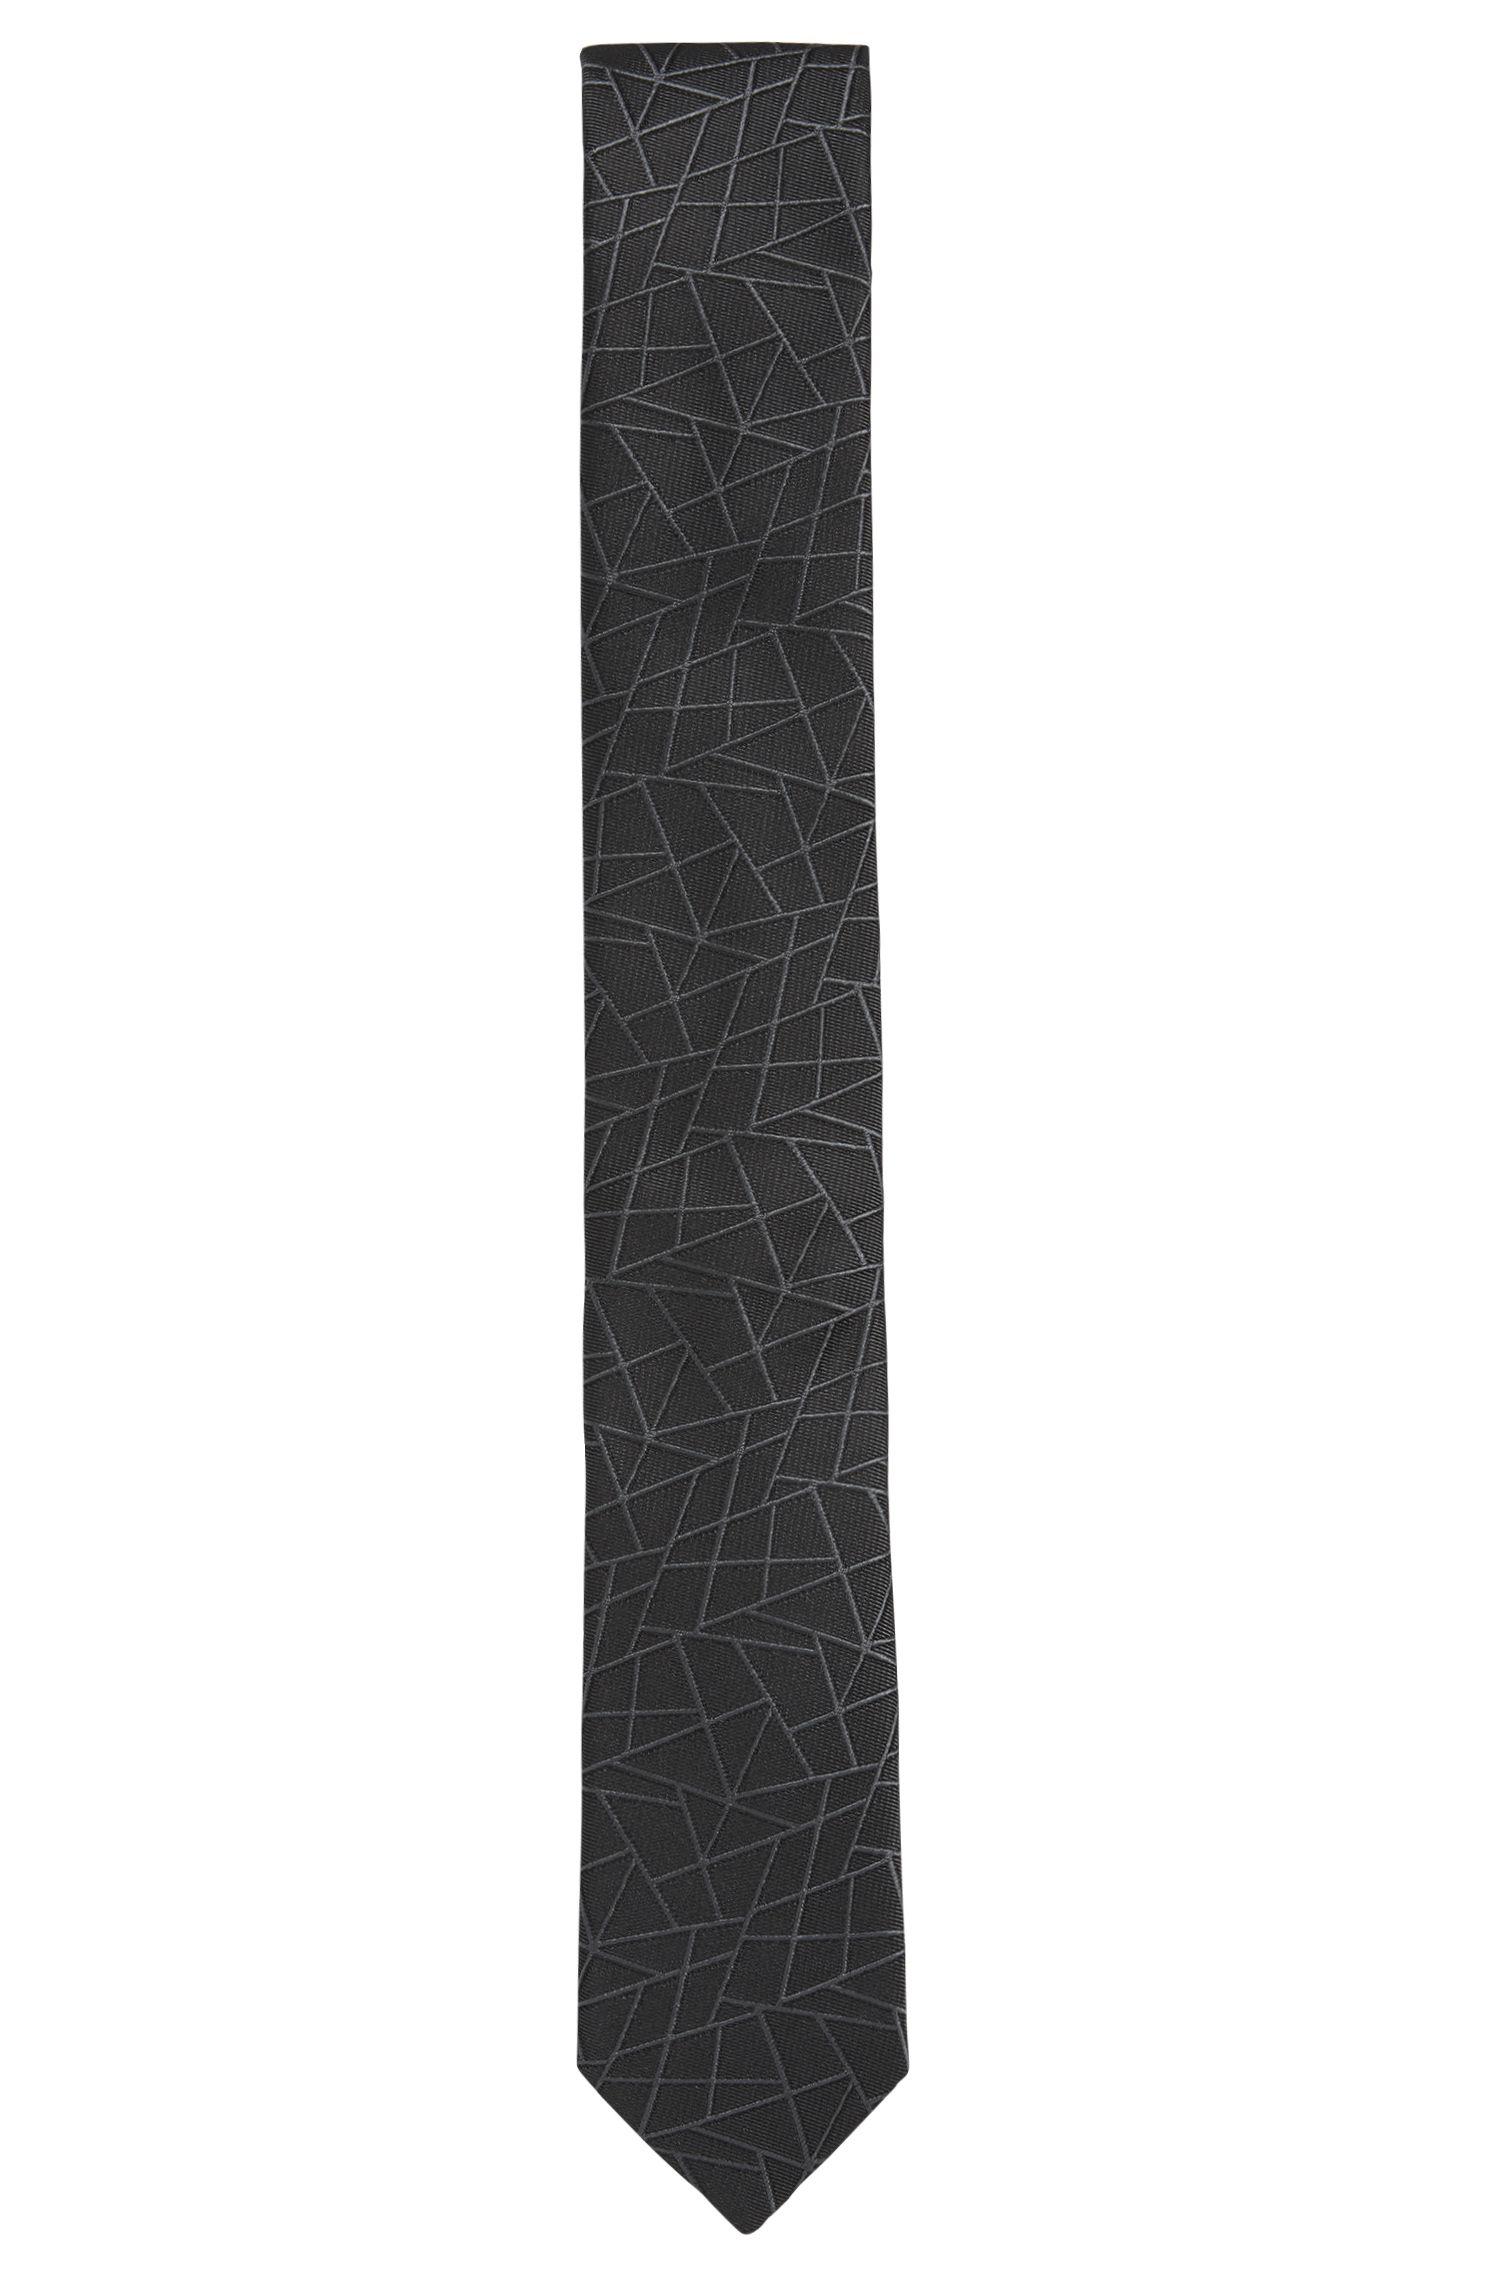 Embroidered Italian Silk Tie, Slim | Tie 6 cm